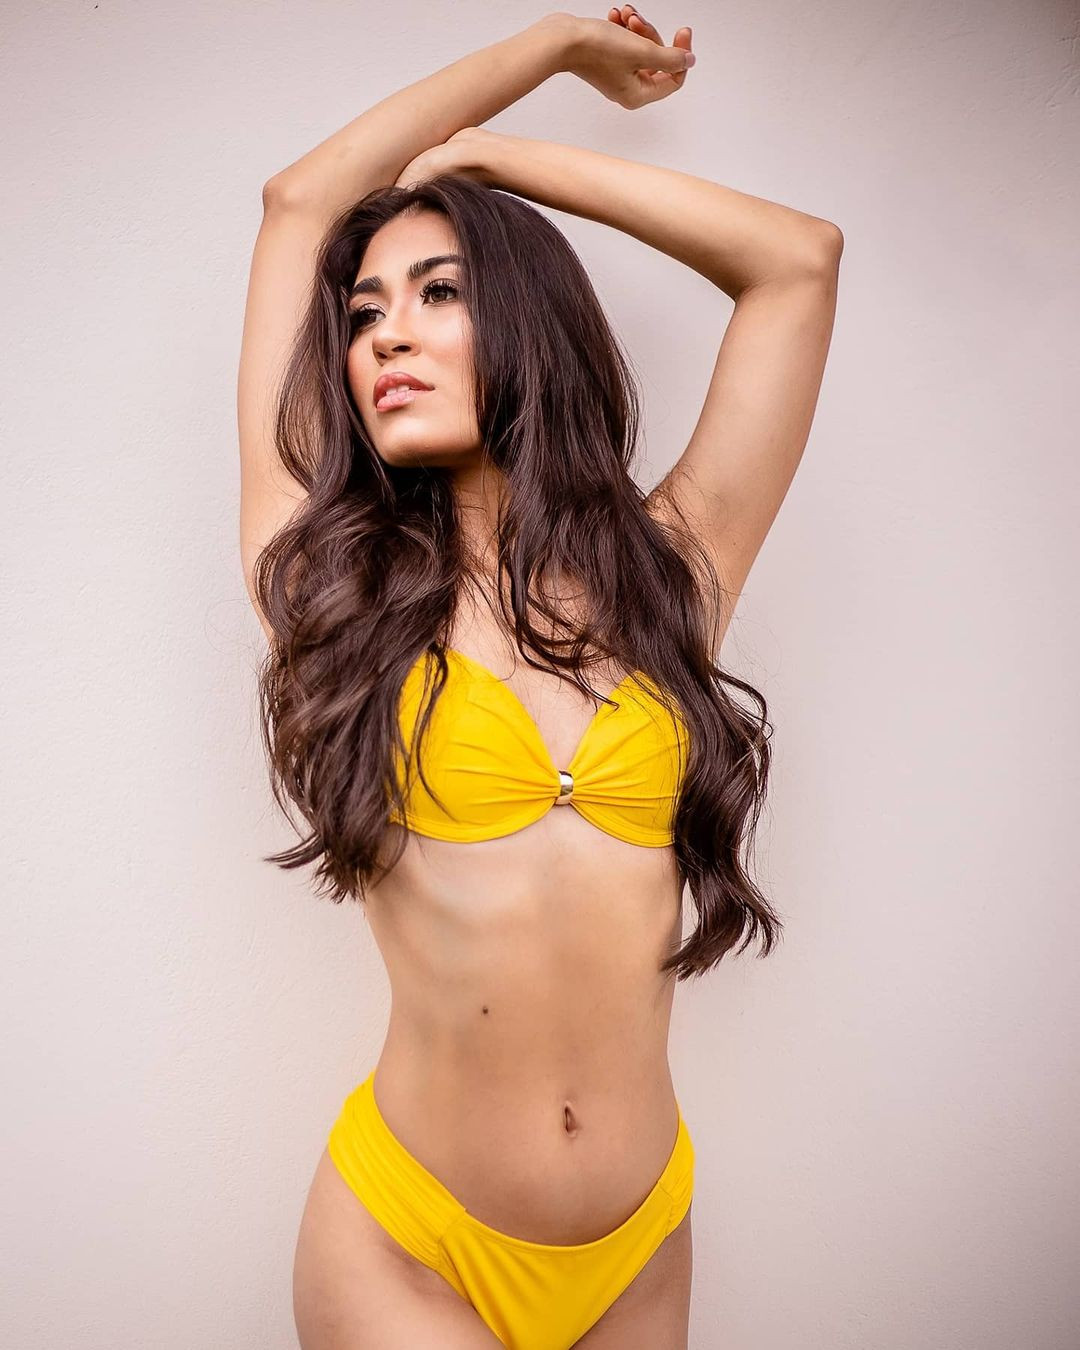 sarah chinikoski, miss brasil intercontinental 2021. Bdbgbp10